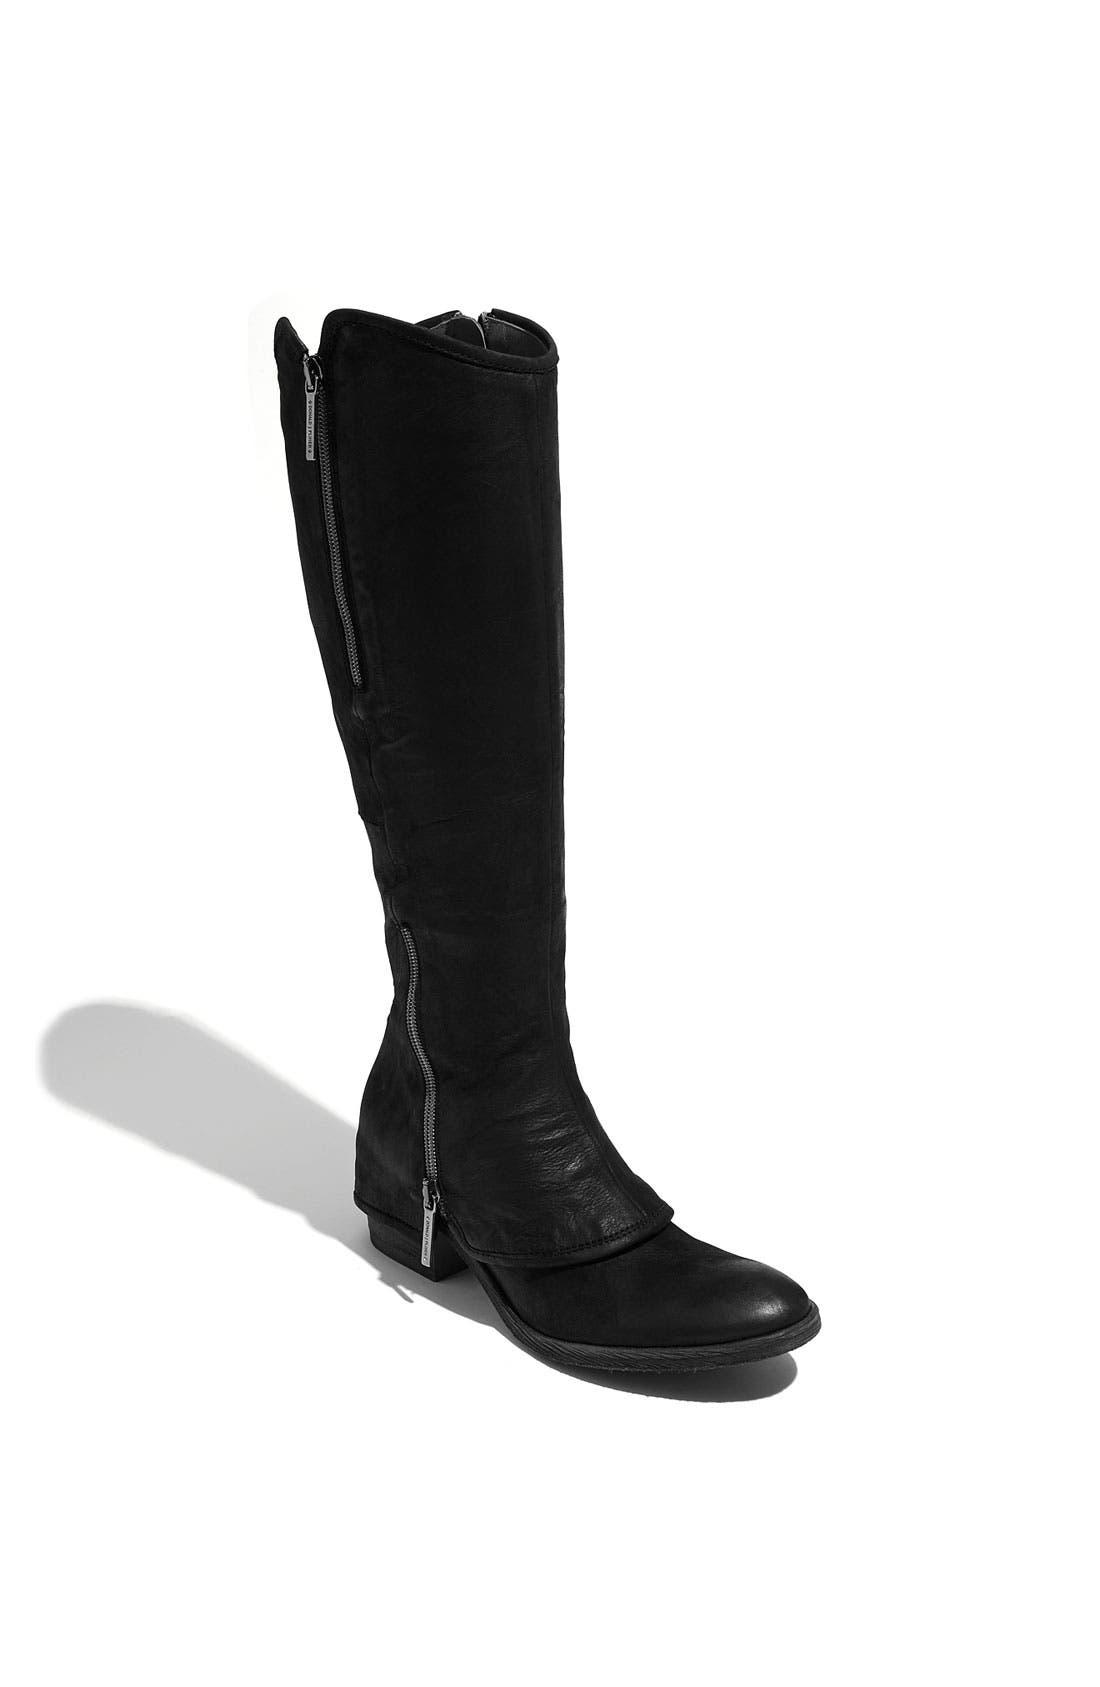 Alternate Image 1 Selected - Donald J Pliner 'Devi' Boot (Women)